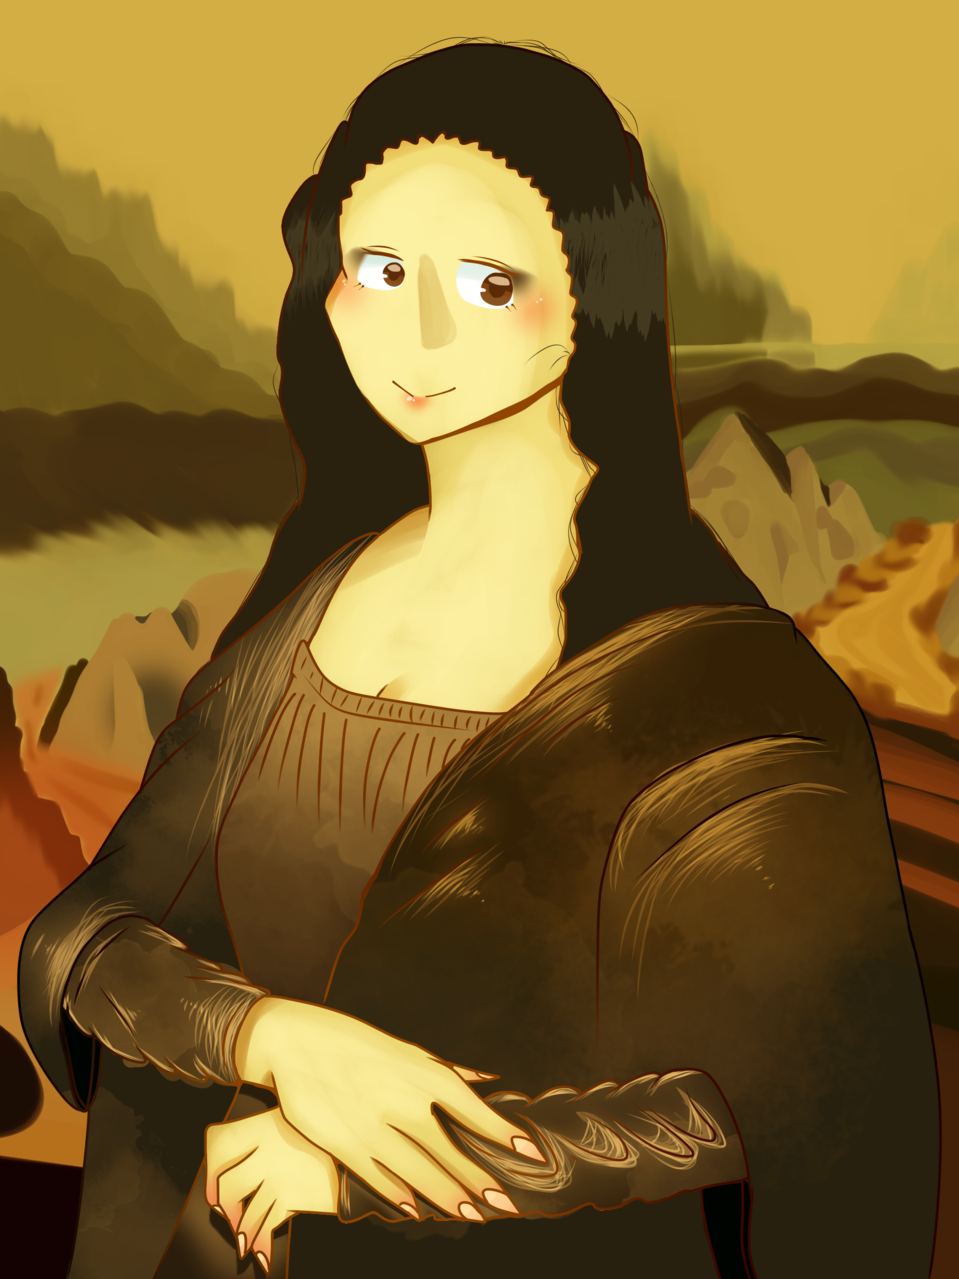 Mona Lisa made me... Illust of Qiya Art MasterpieceFanart medibangpaint art Monalisa original